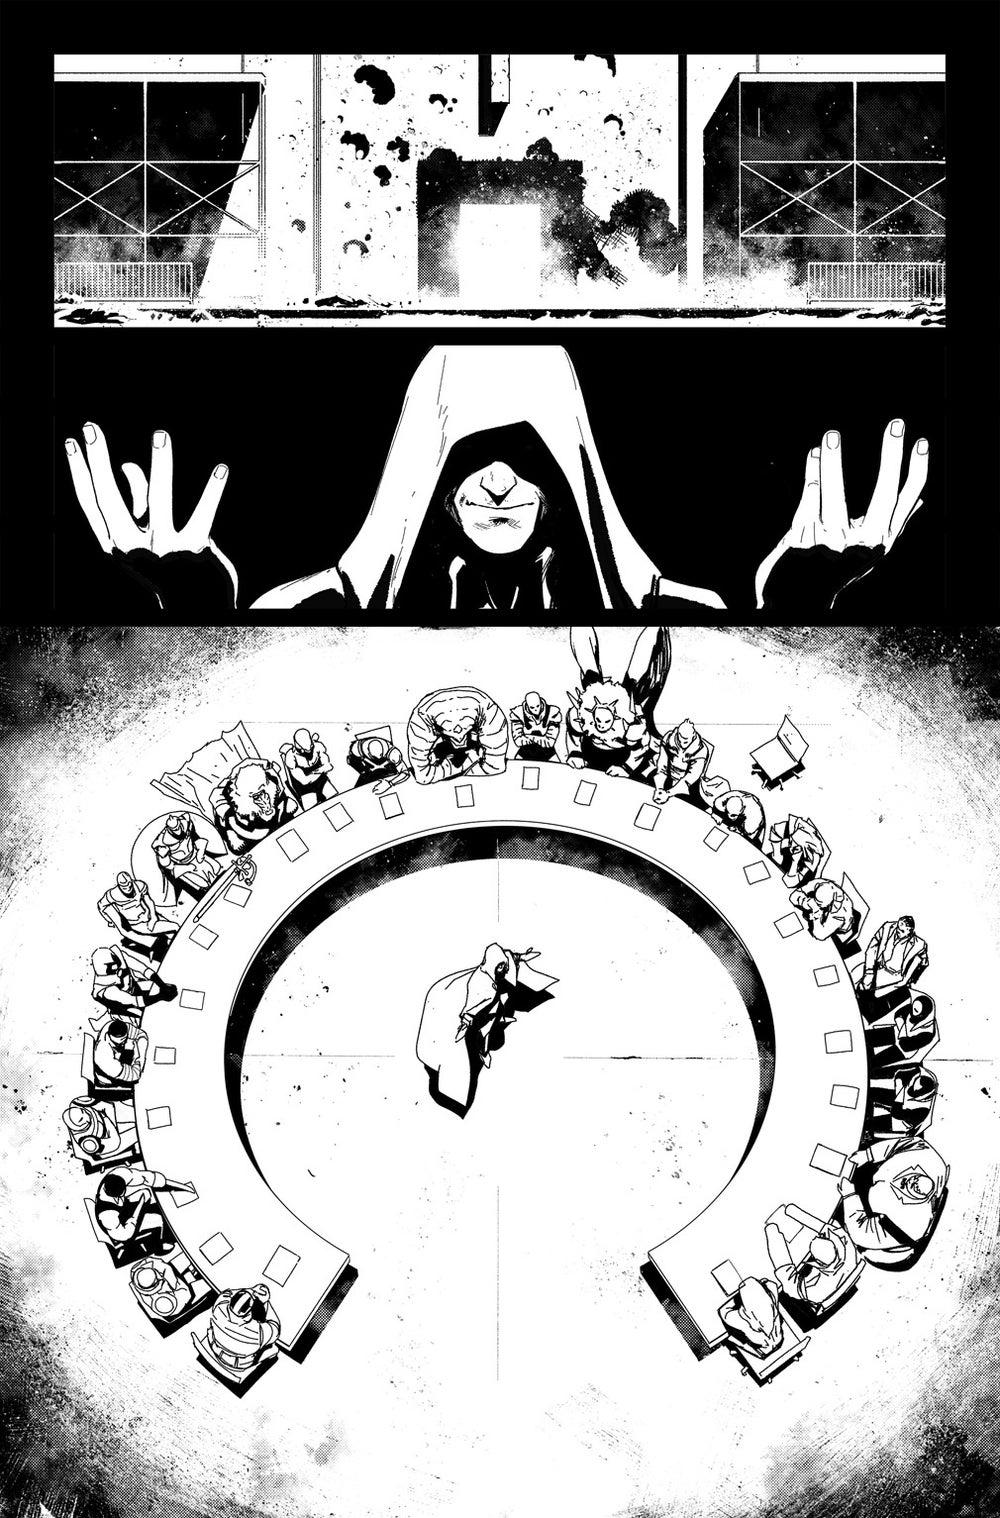 Image of DEFENDERS #10, p.17 ARTIST'S PROOF